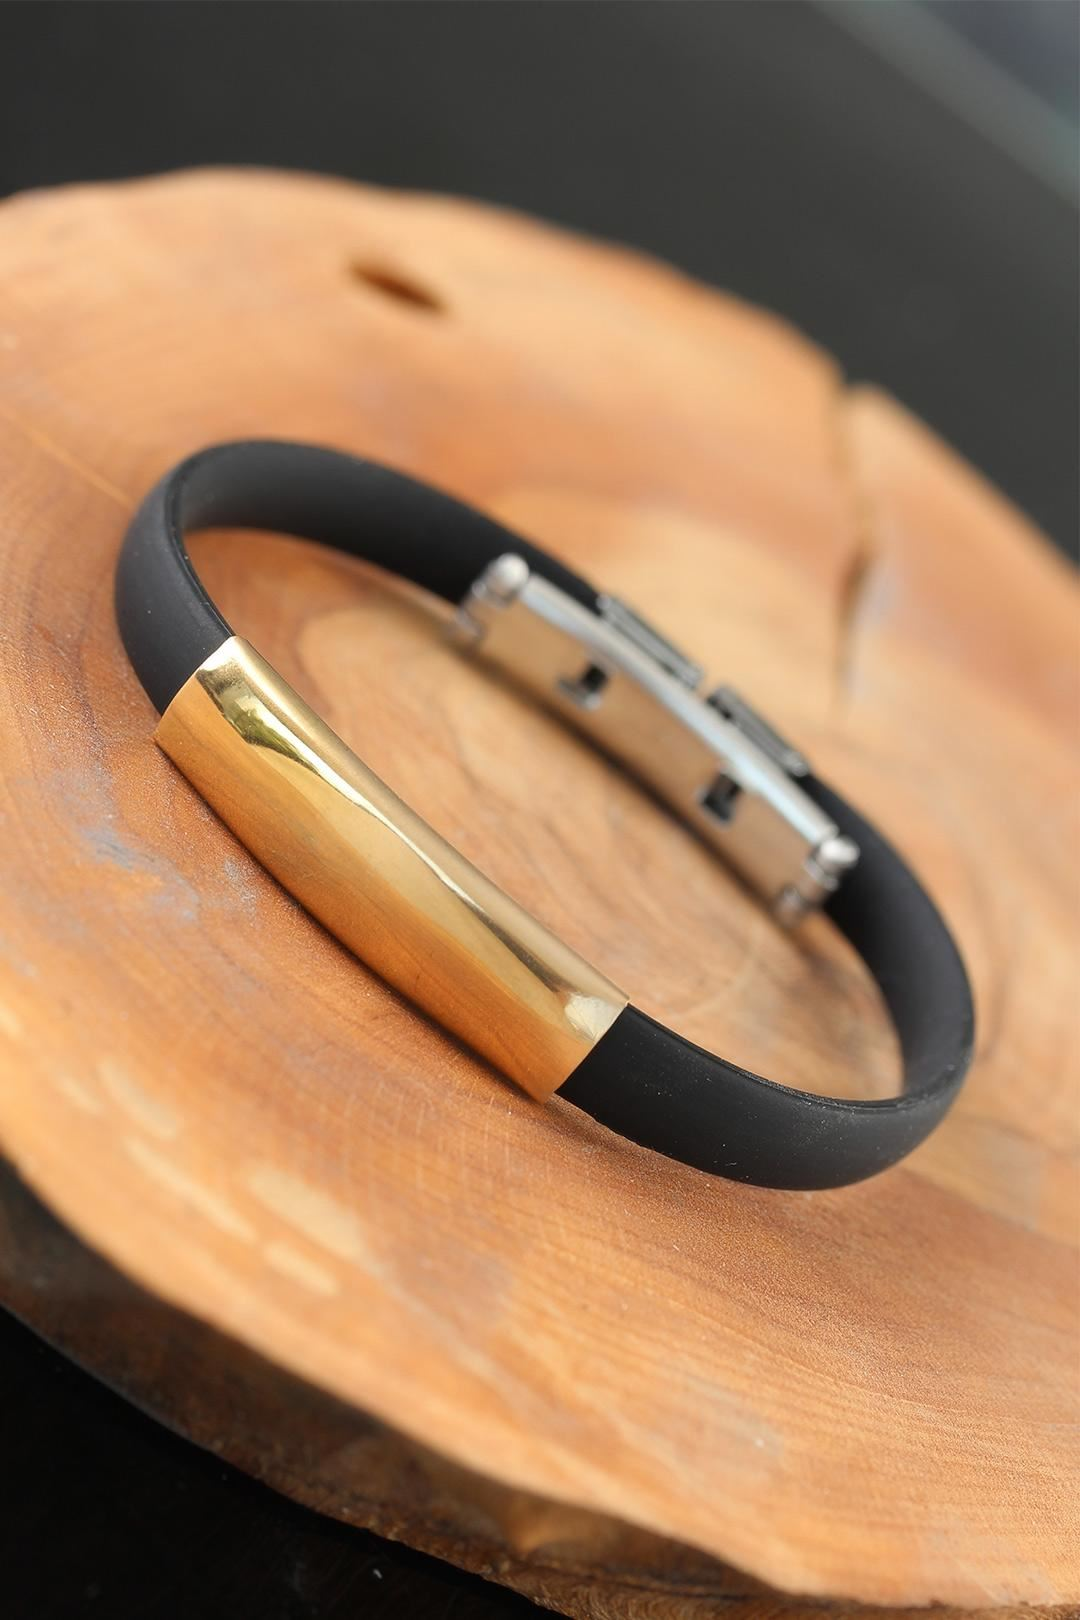 Gold Renk Metal Tasarım Siyah Renk Silikon Erkek Bileklik